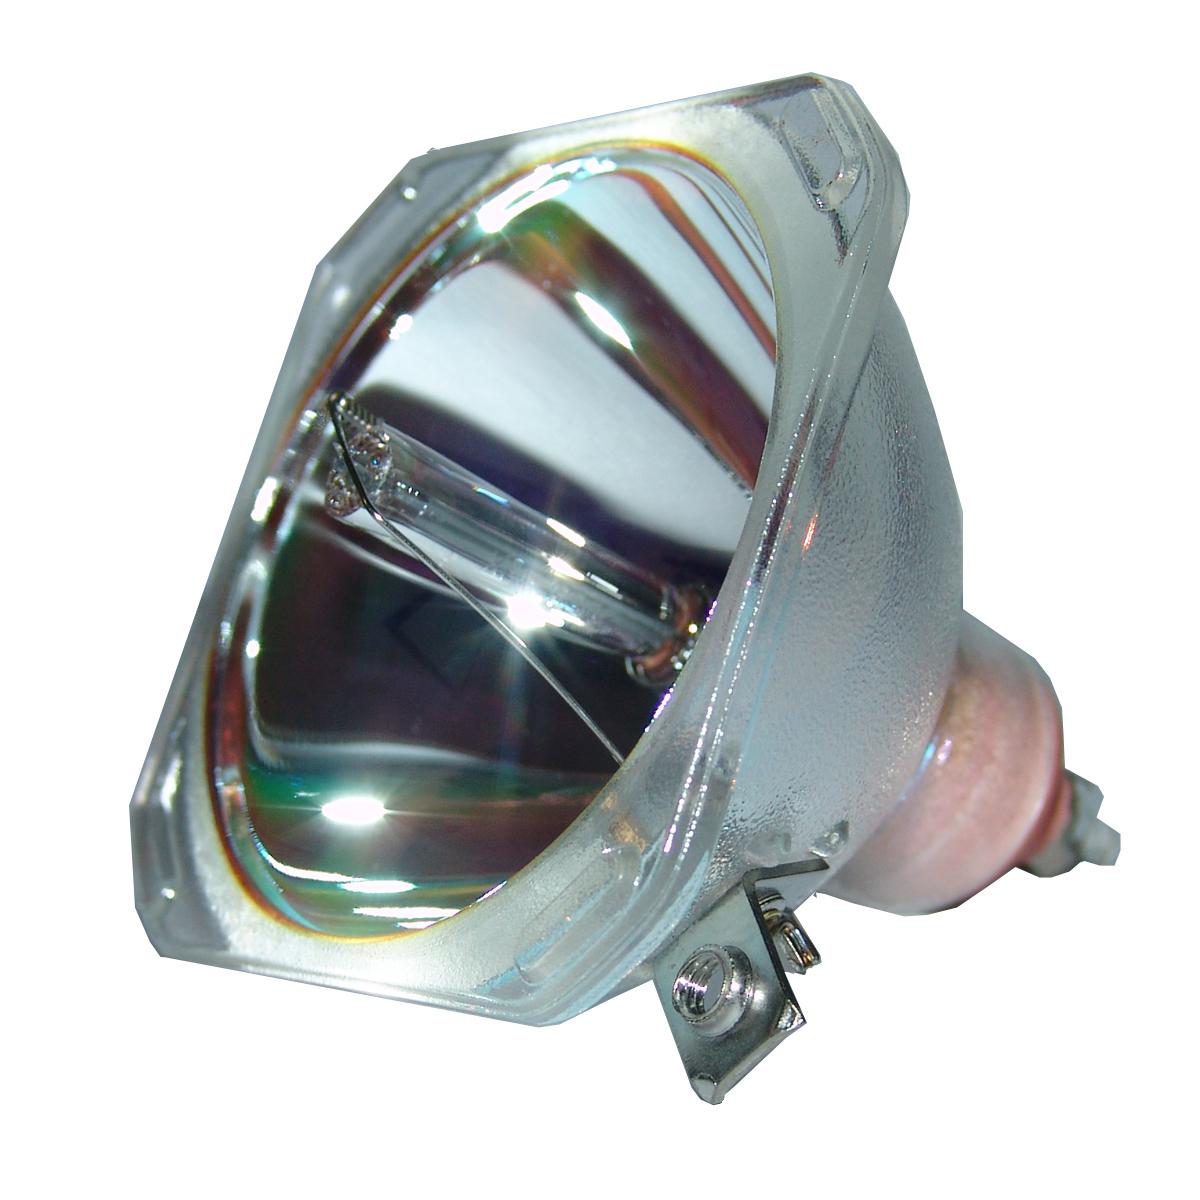 Osram Bare Lamp For Sony KDF-55E2000 / KDF55E2000 Projection TV Bulb DLP